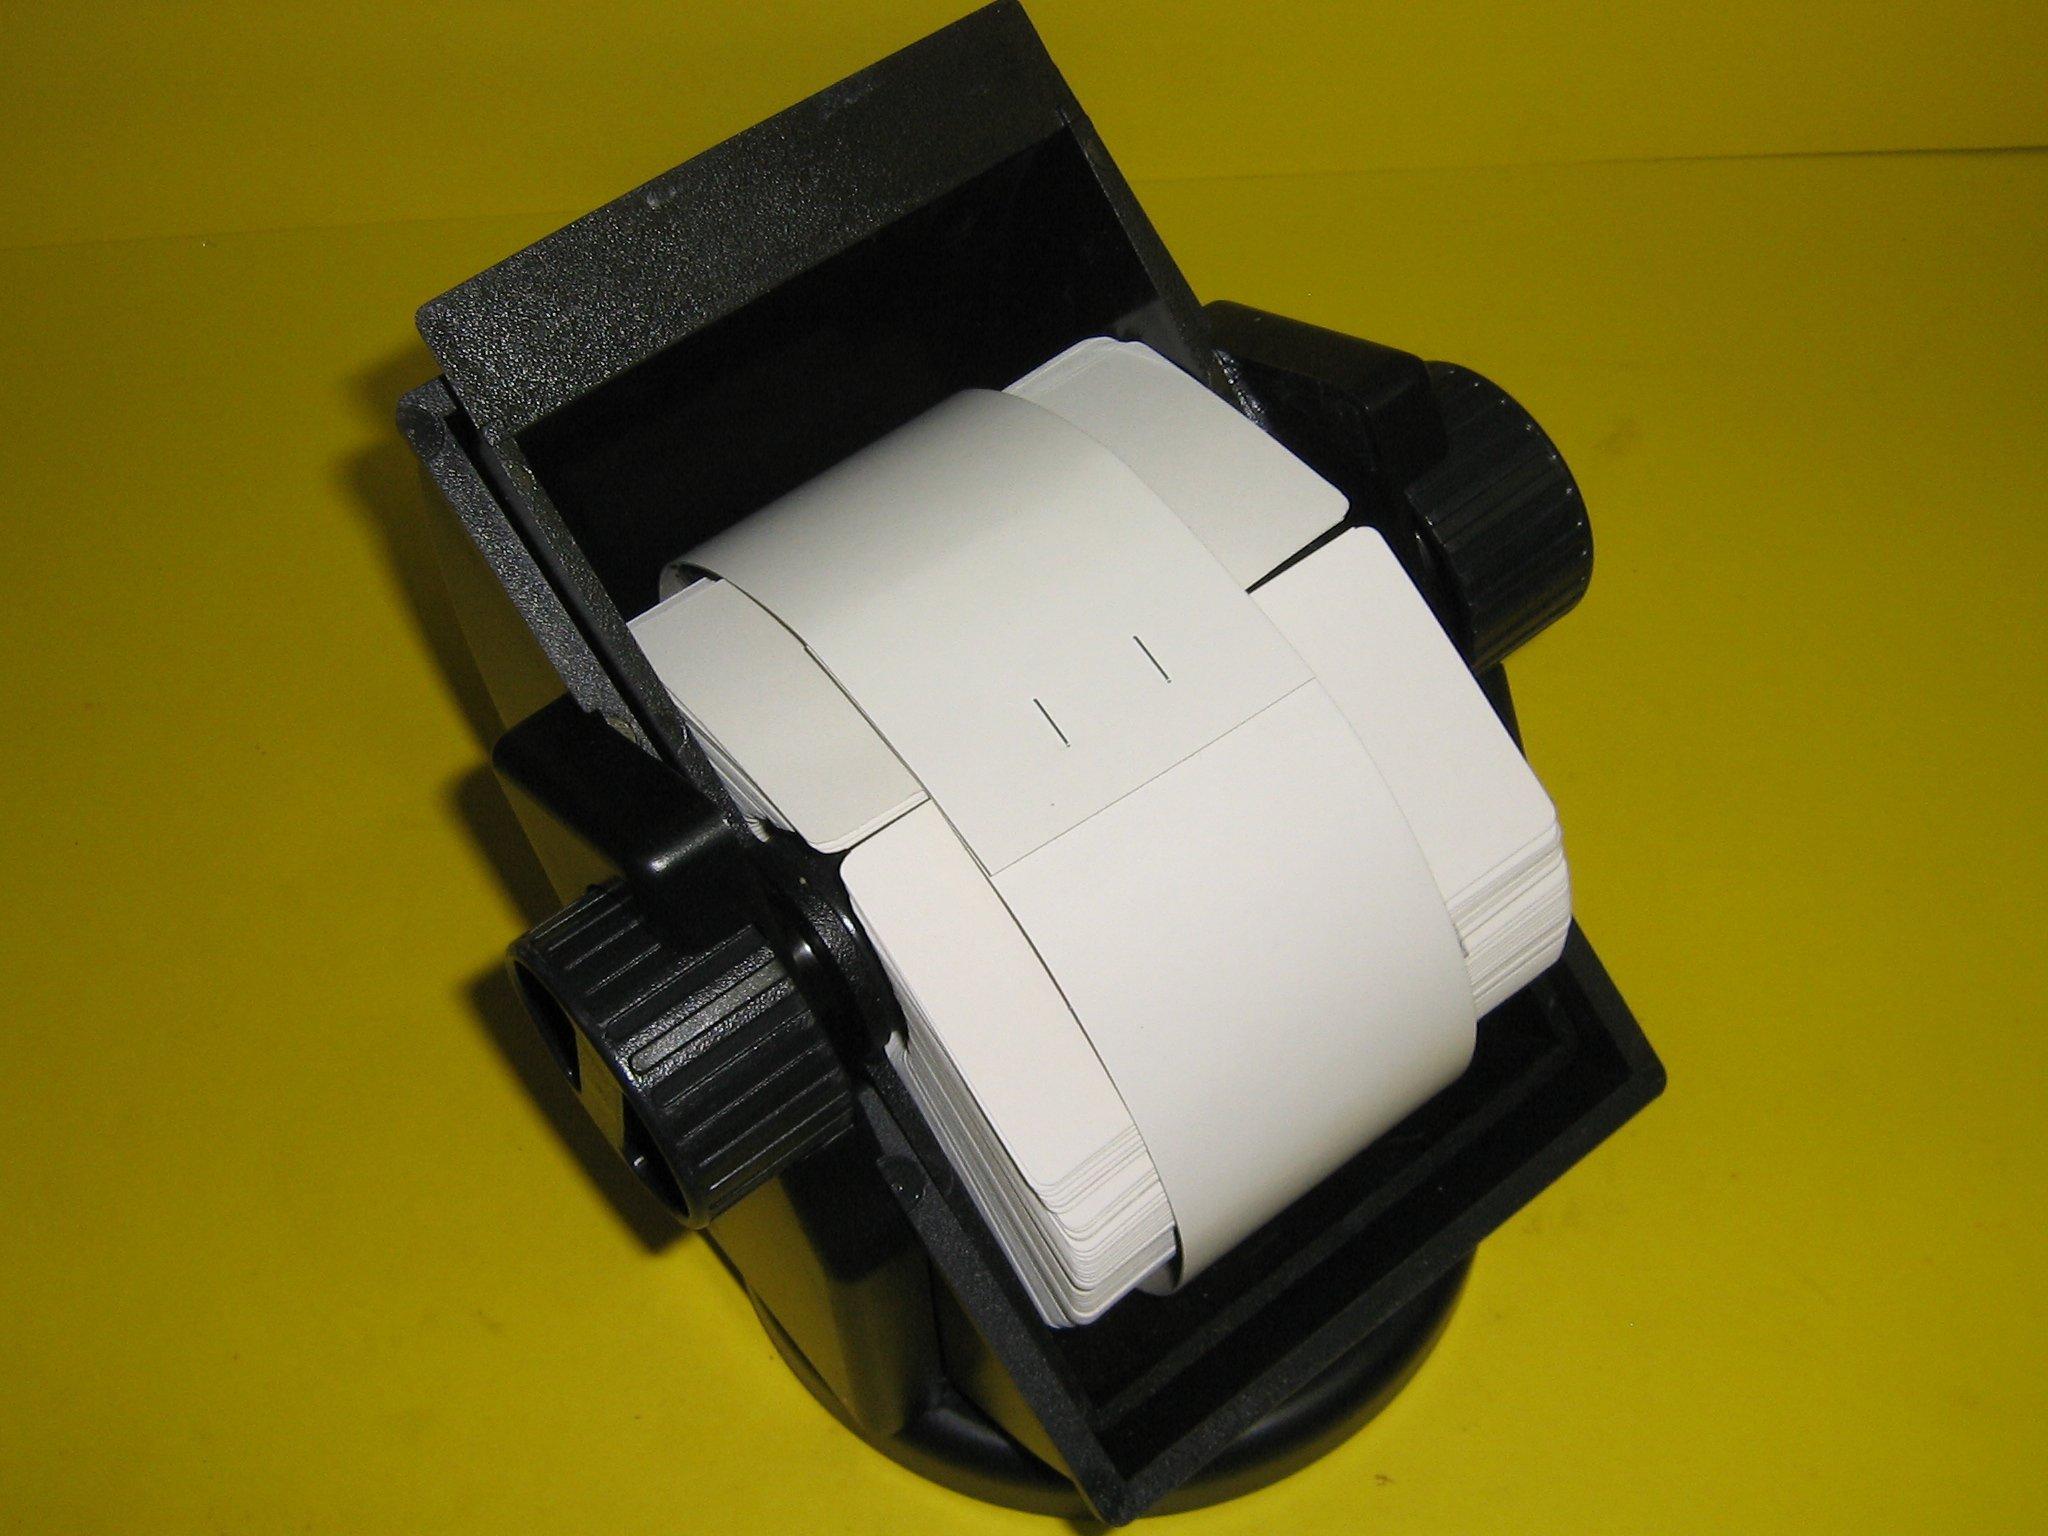 Bates®, Revolver, Covered Rotary, Swivel File, Turns 360 Degrees, 500 Cards, 2 1/4'' x 4'', Black, RSWC24-BK